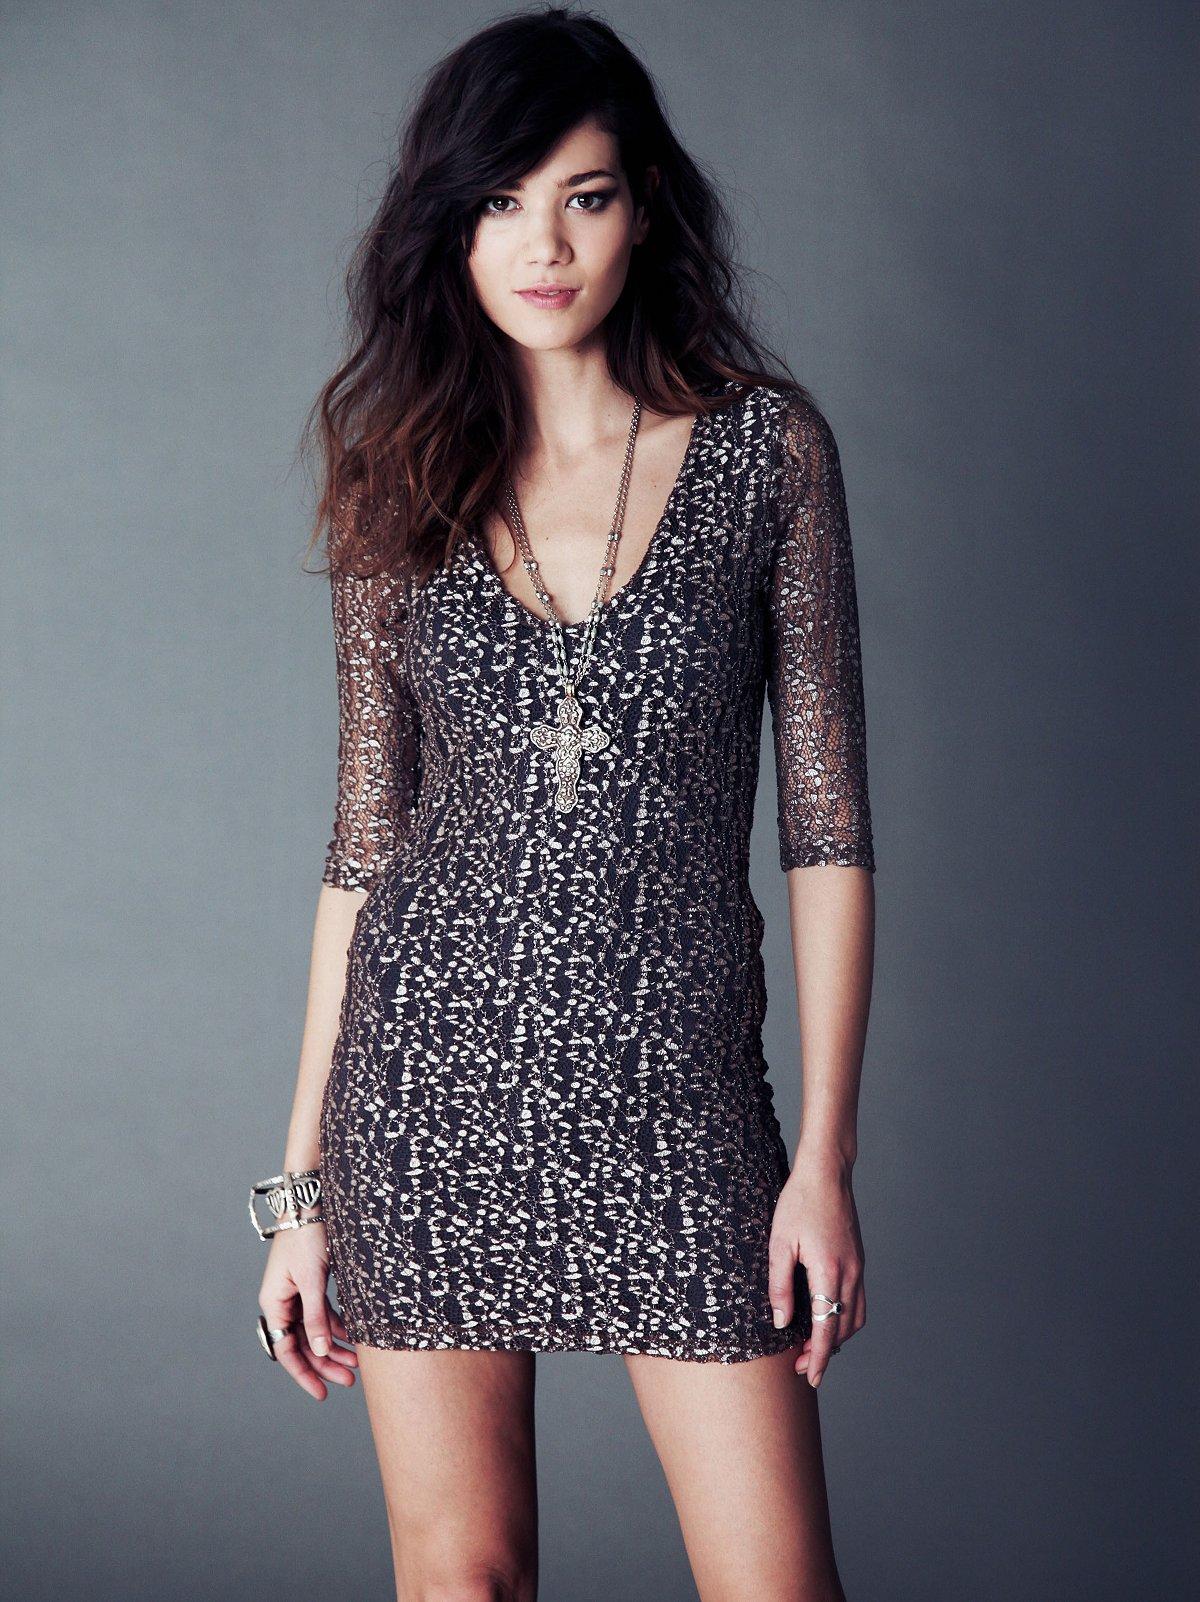 Cheetah Lace Deep V Dress